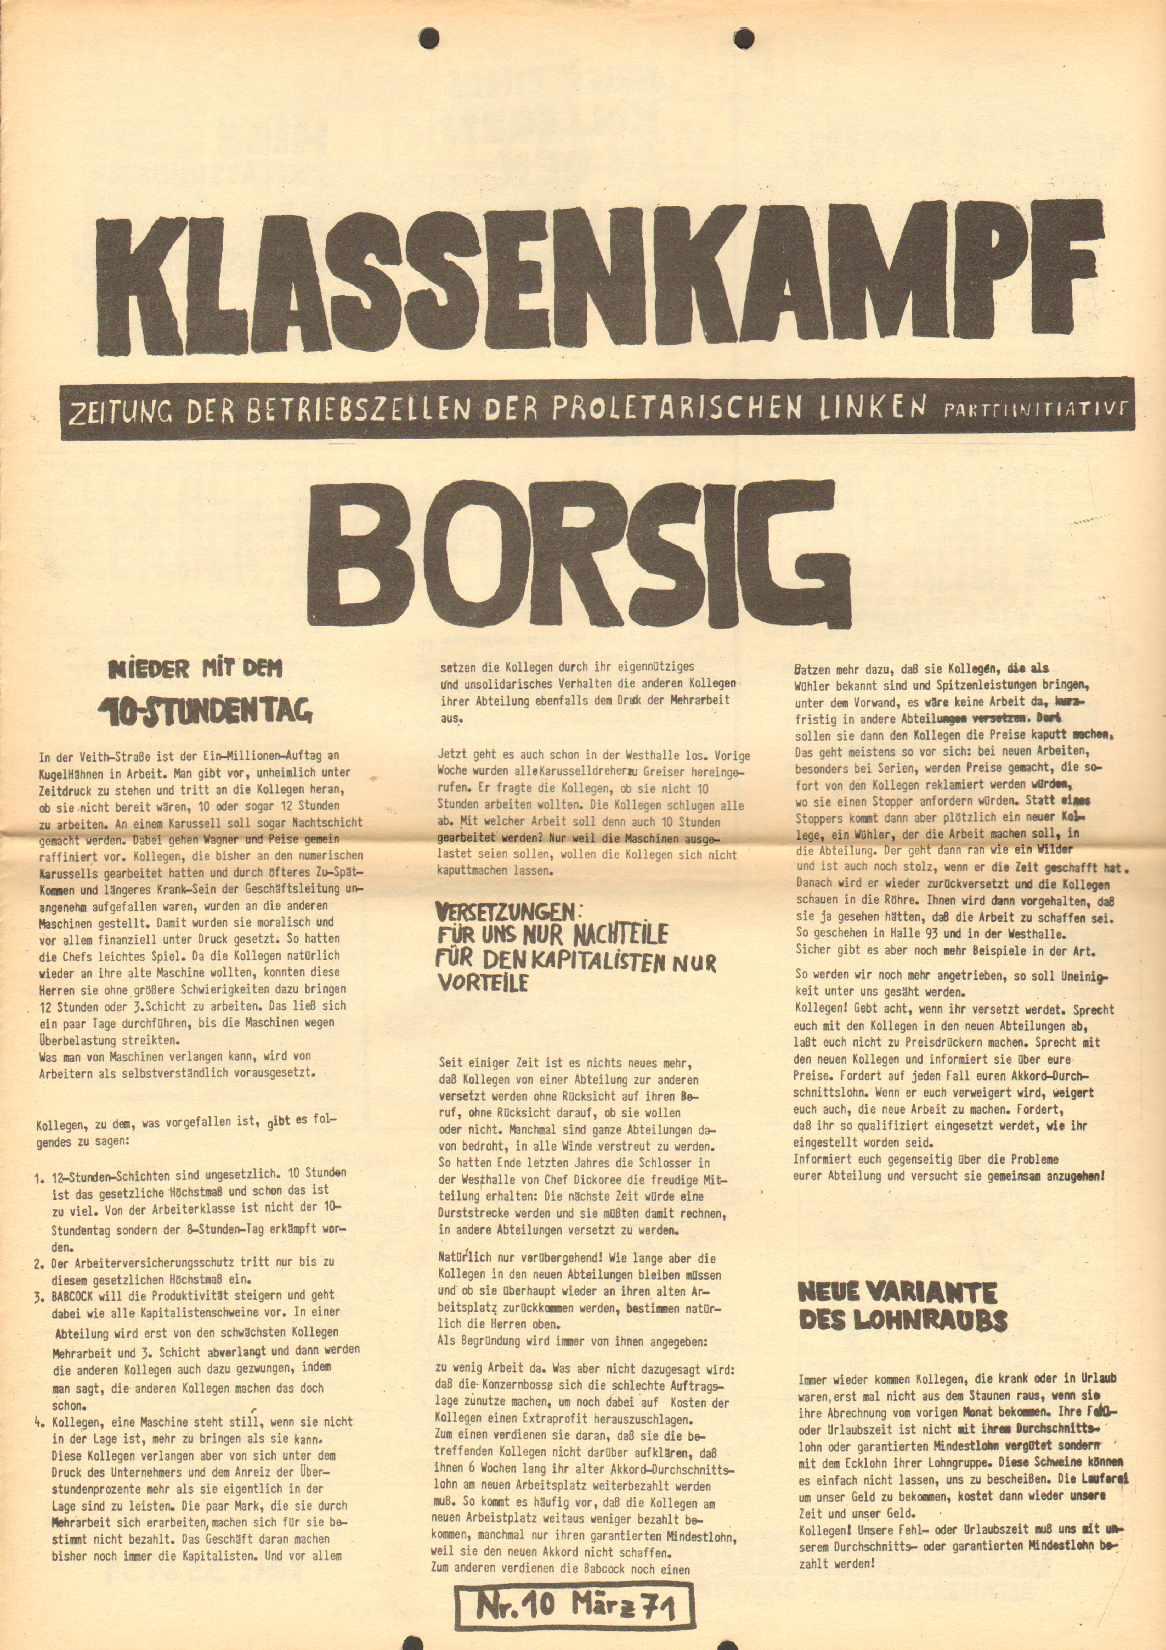 Berlin_Borsig033